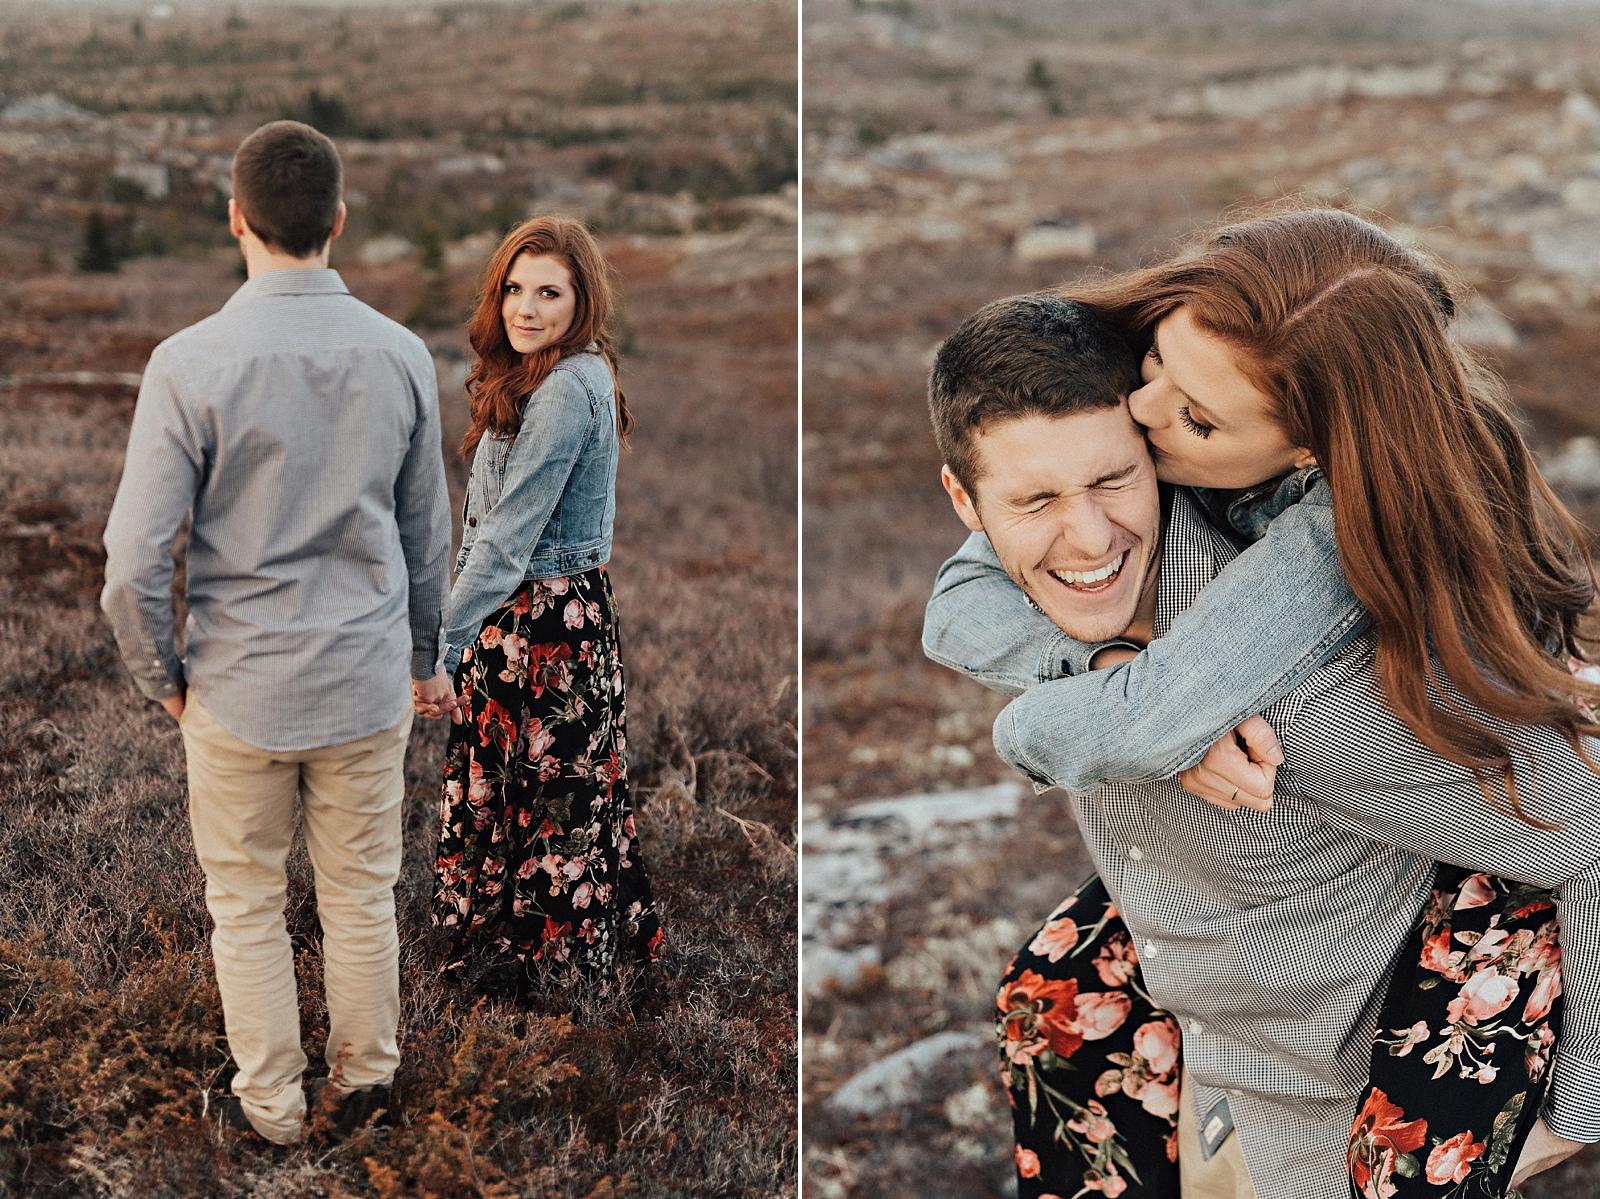 Halifax-Wedding-Photographer_Annie&Ryan_Ocean-Engagement-Shoot_33.jpg